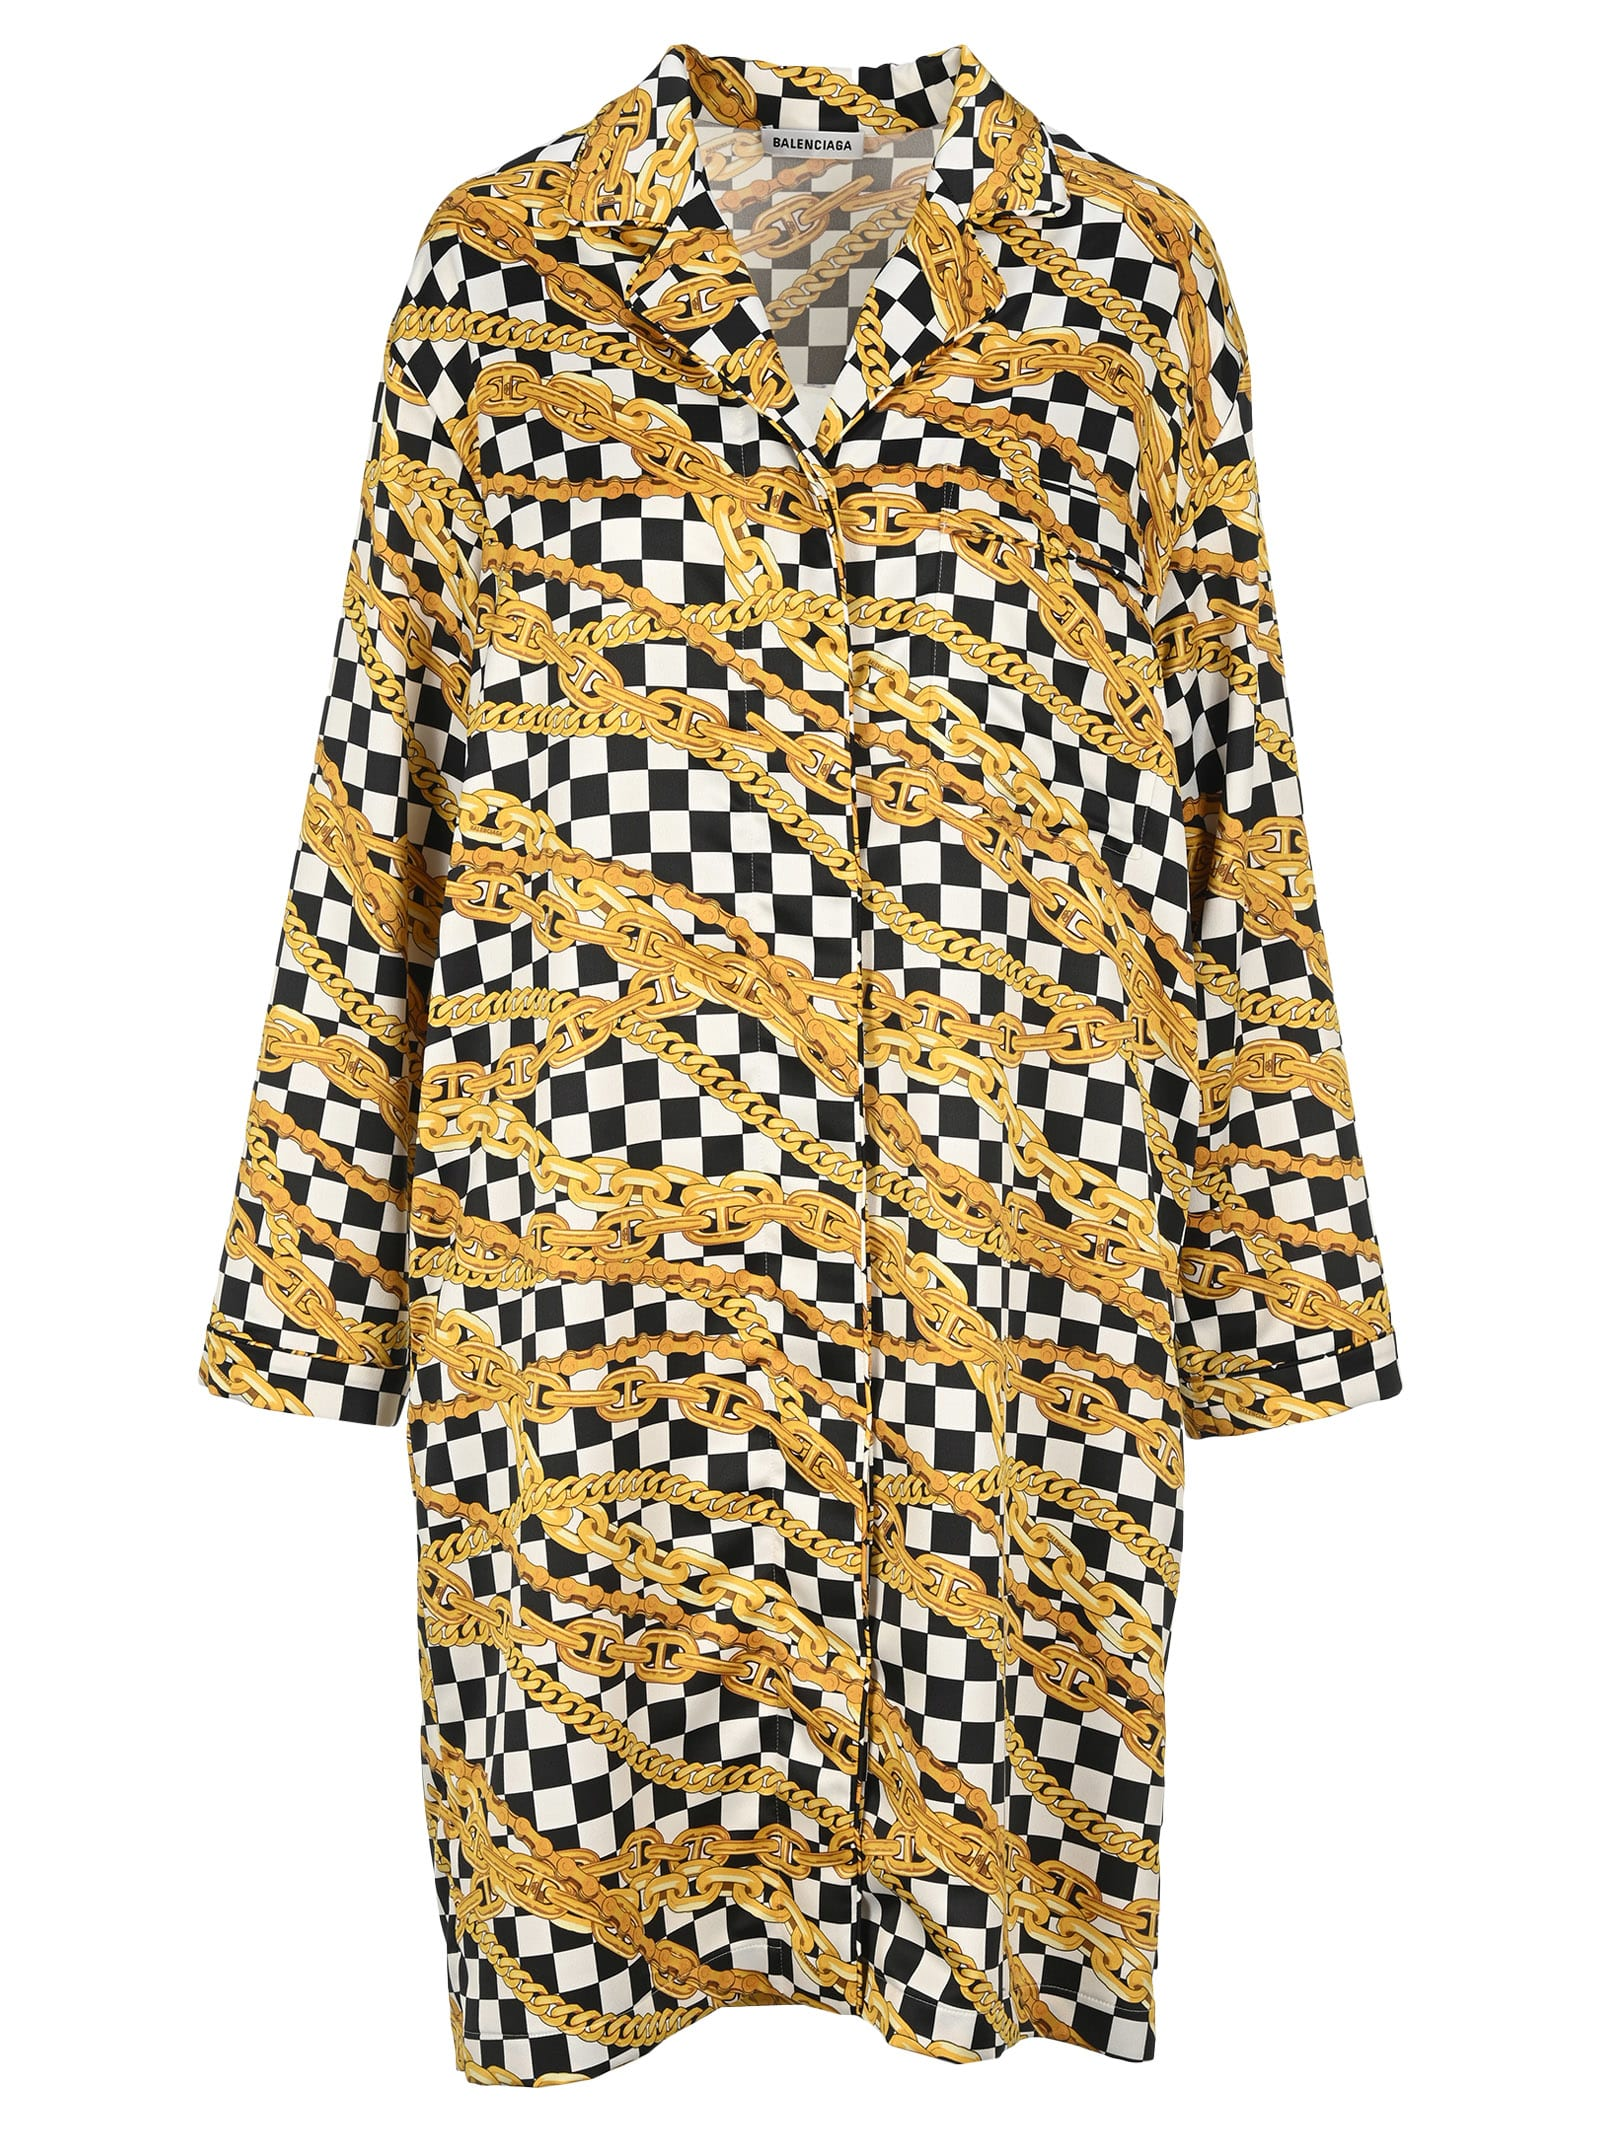 Buy Balenciaga Chain Print Checkerboard Dress online, shop Balenciaga with free shipping